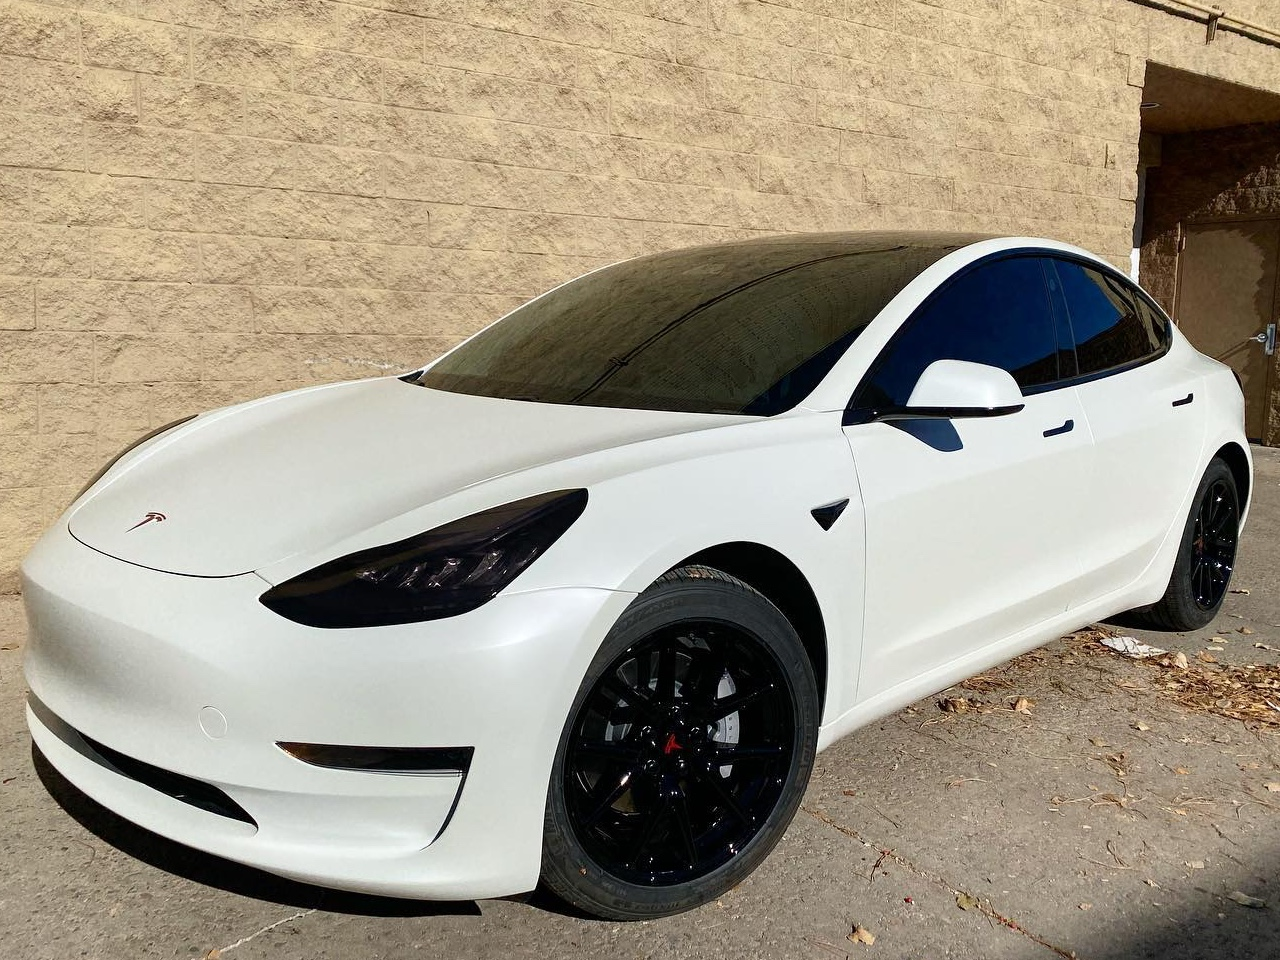 Tesla Model 3 ceramic window tinting front view